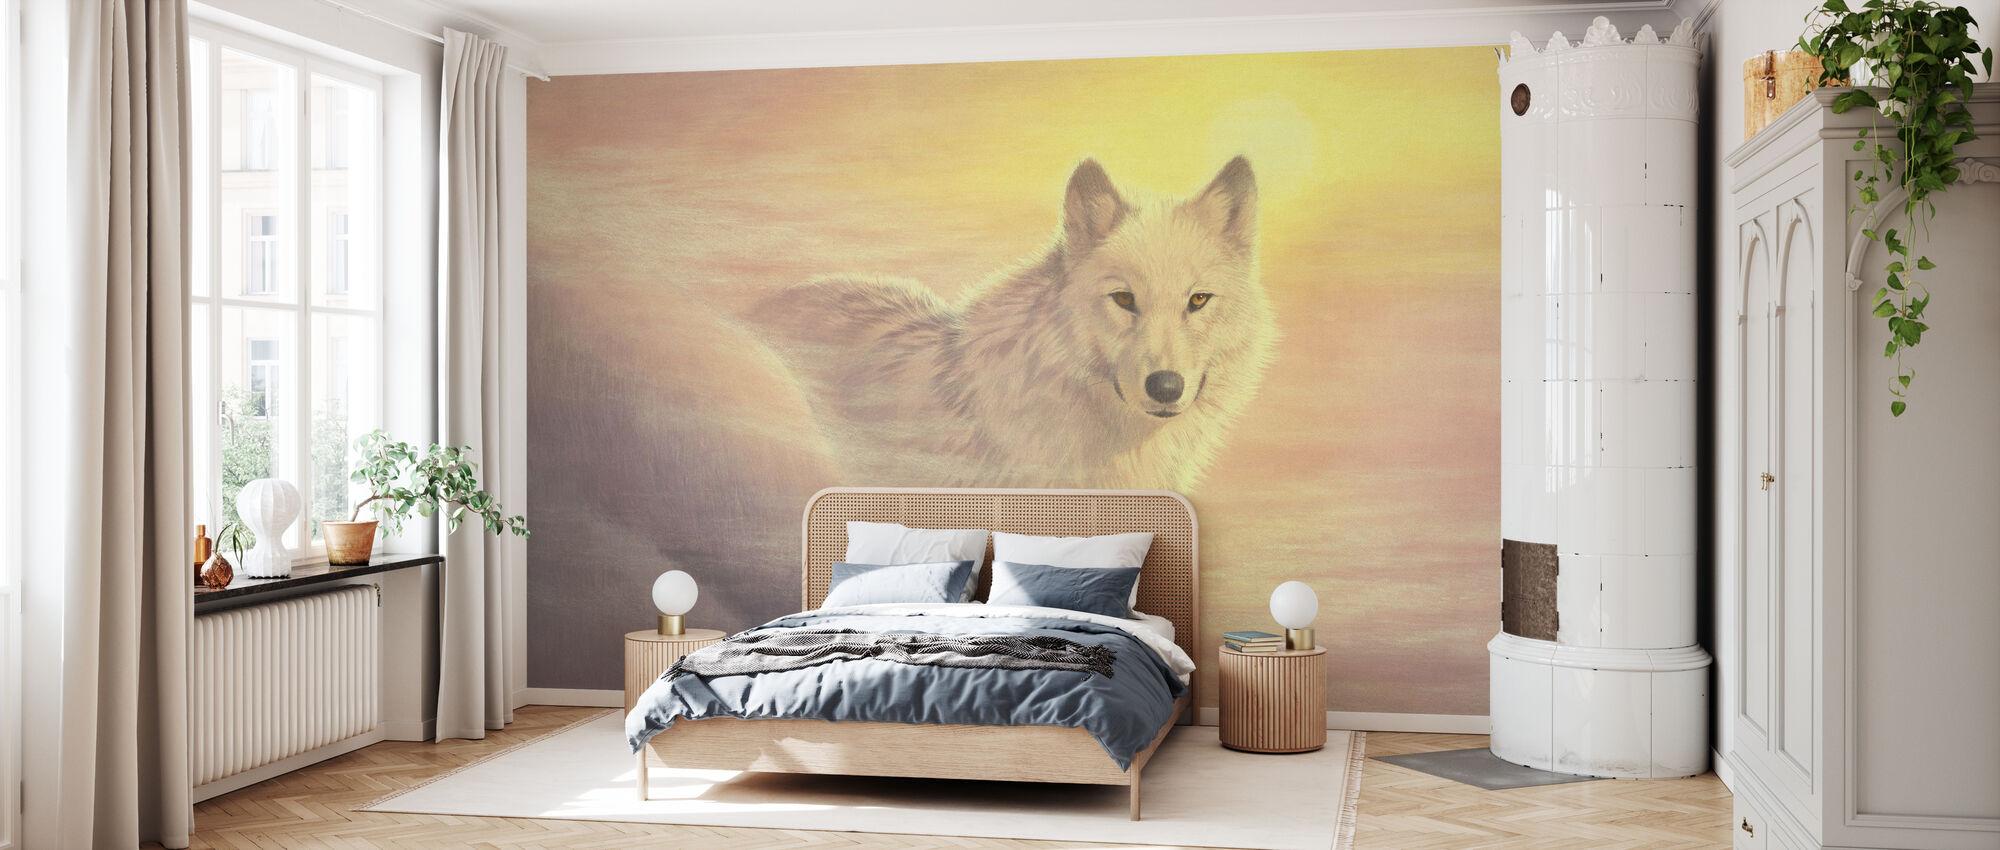 Mystisk ulv - Tapet - Soverom